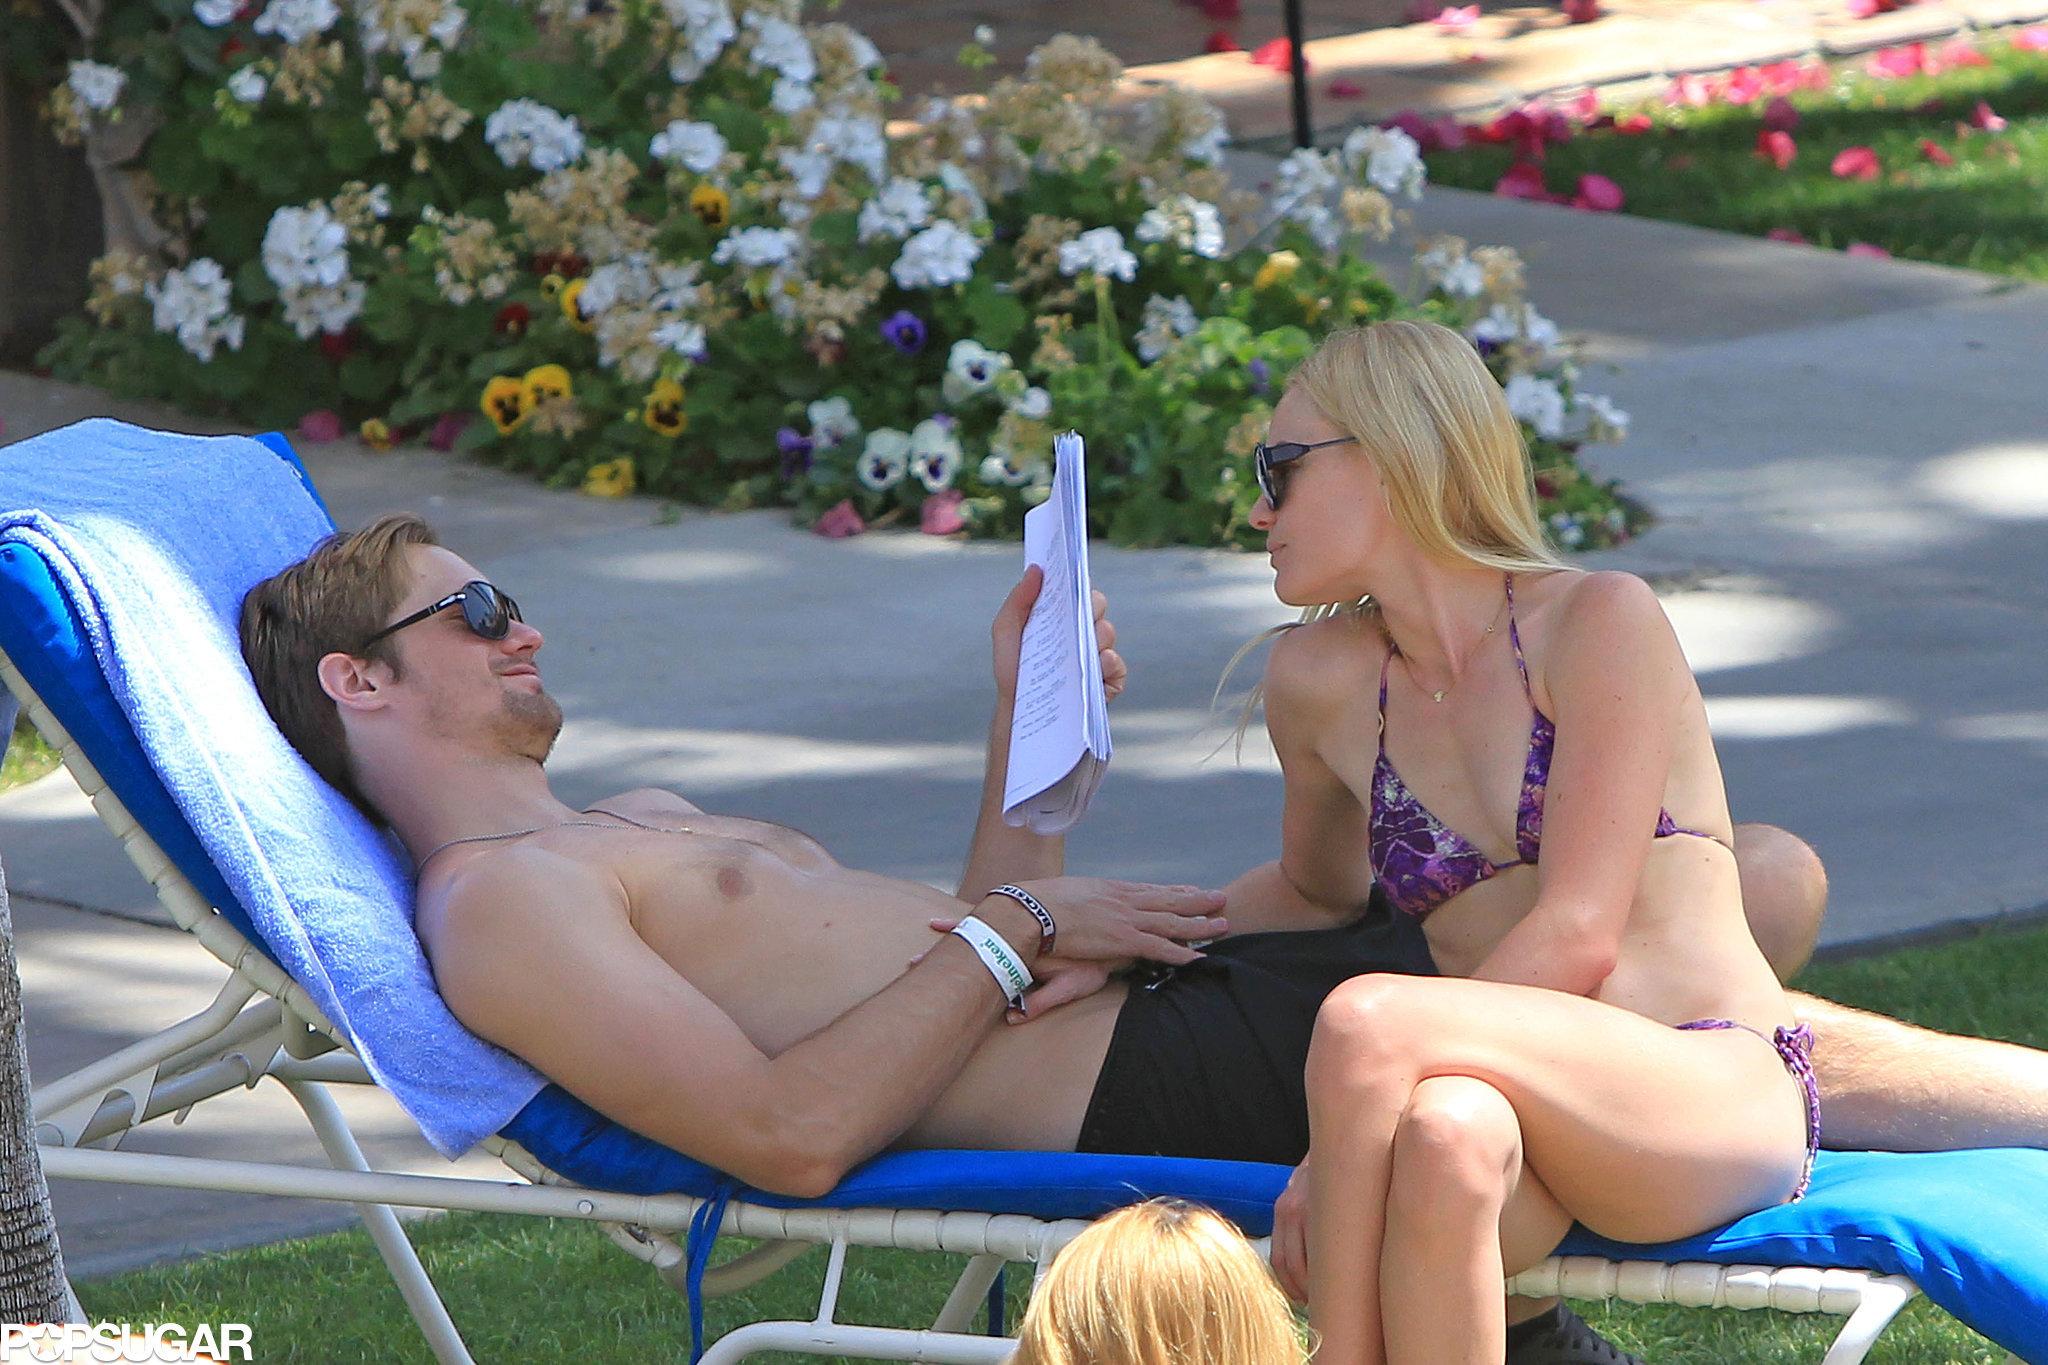 Kate Bosworth lounged in a bikini with boyfriend Alexander Skarsgard in 2010.